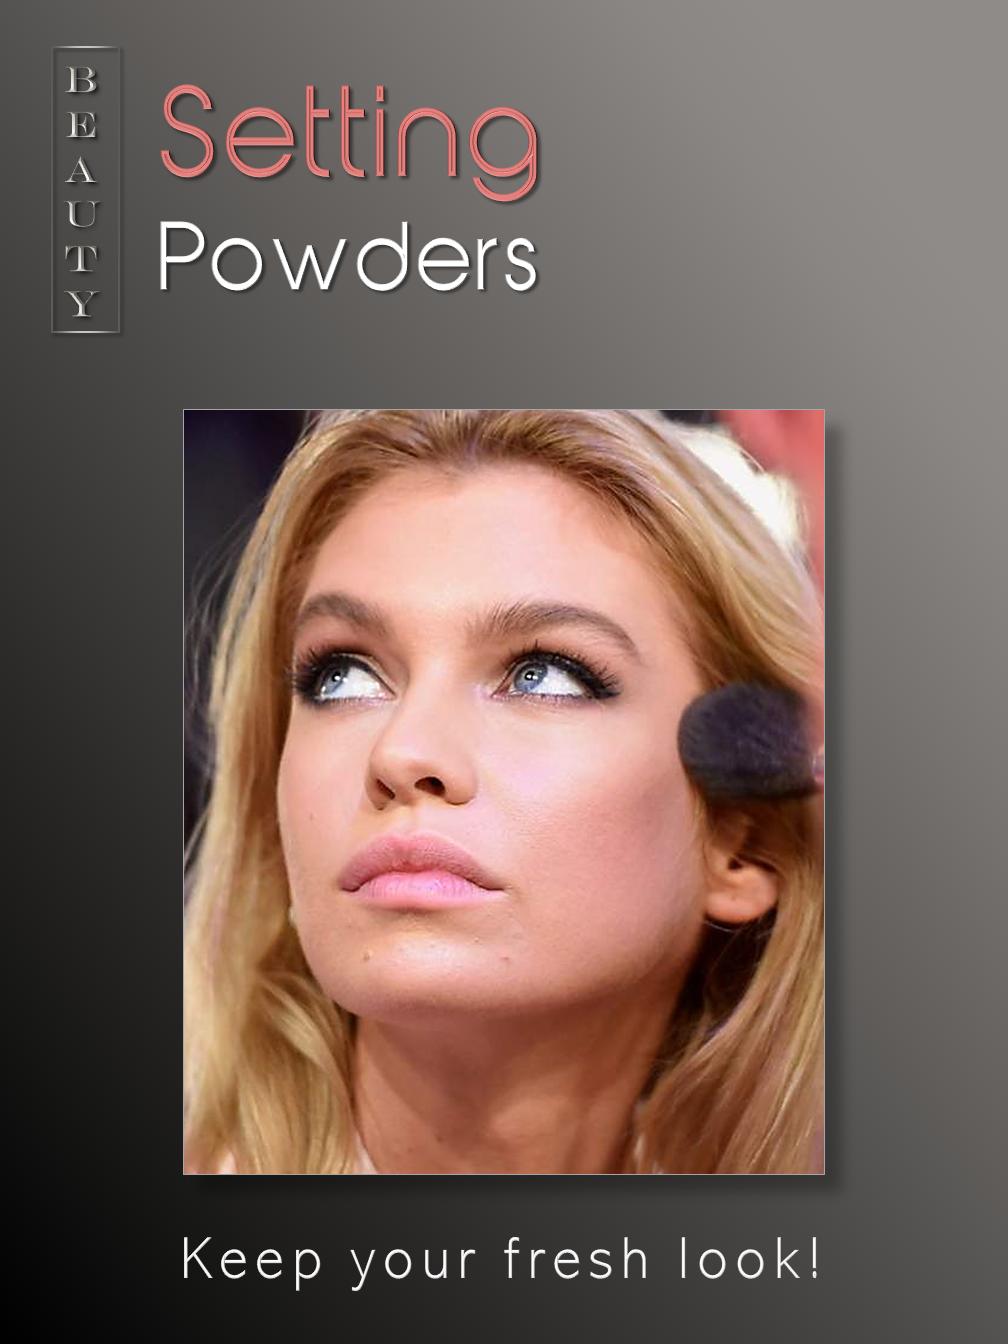 Setting Powders